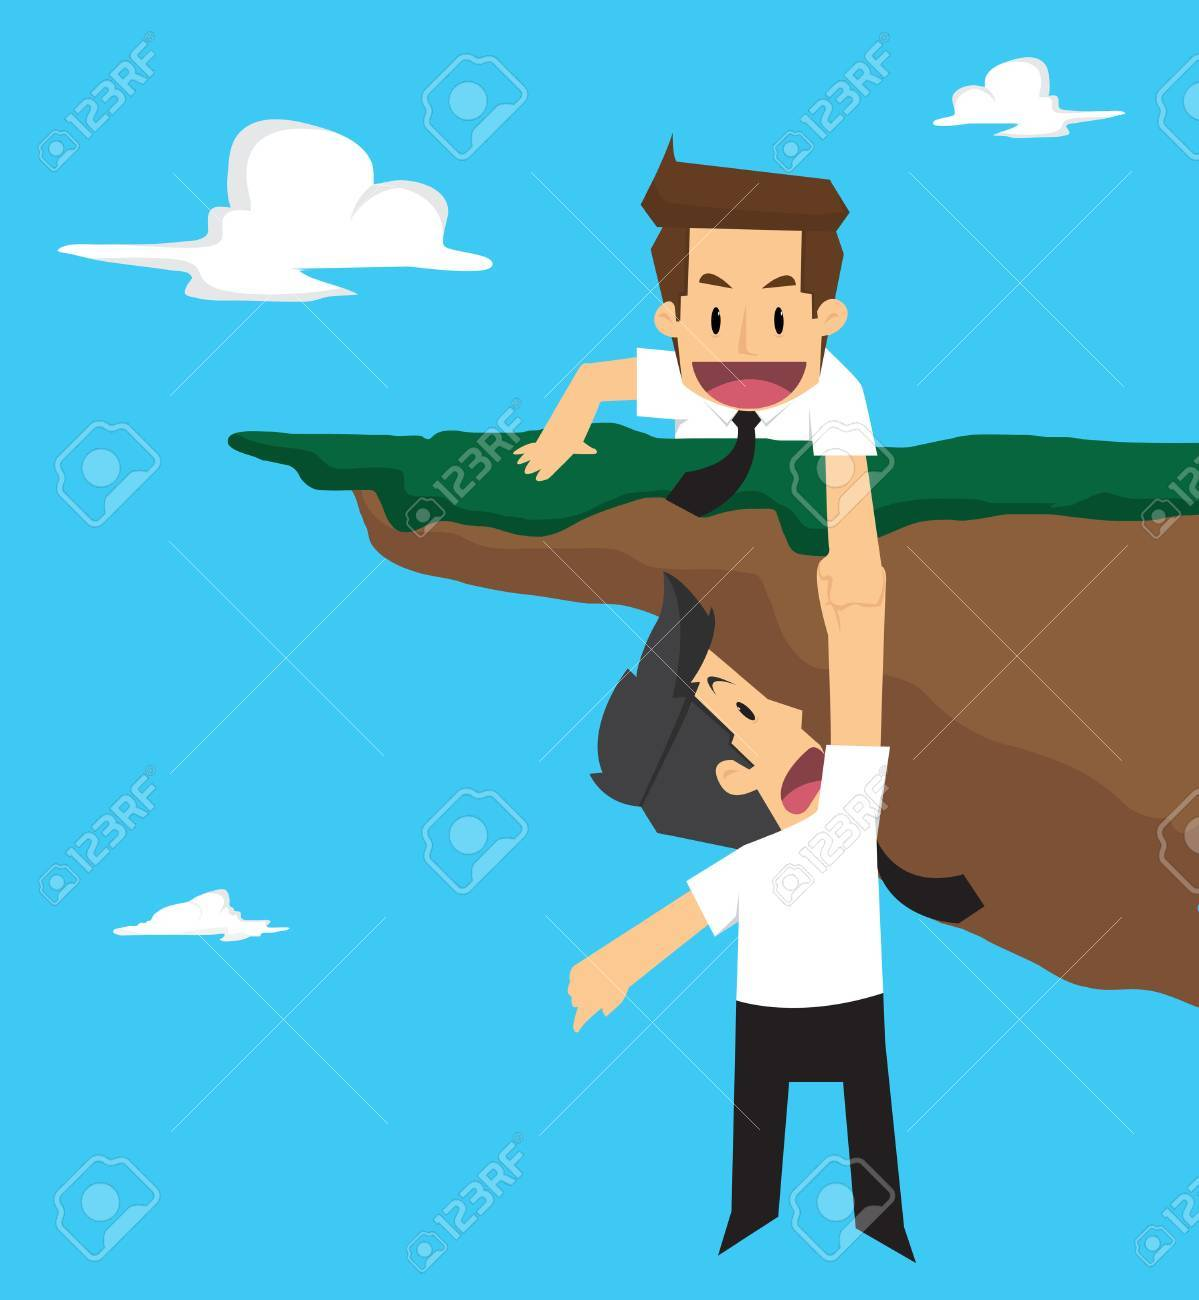 businessman teamwork. vector - 56096162